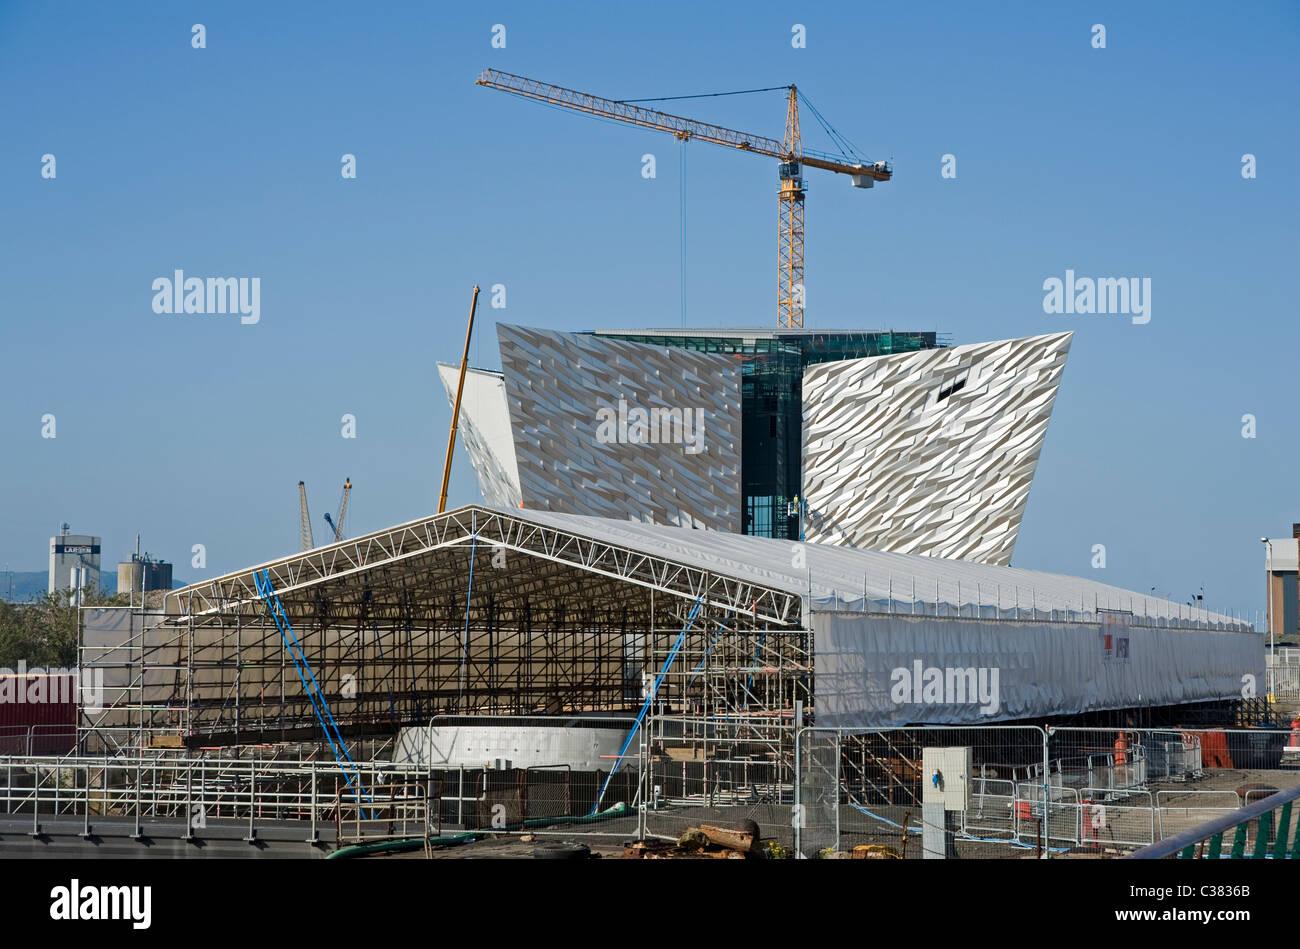 SS Nomadic undergoing restoration in the Titanic Quarter, Belfast. Titanic Museum under constuction in background. - Stock Image